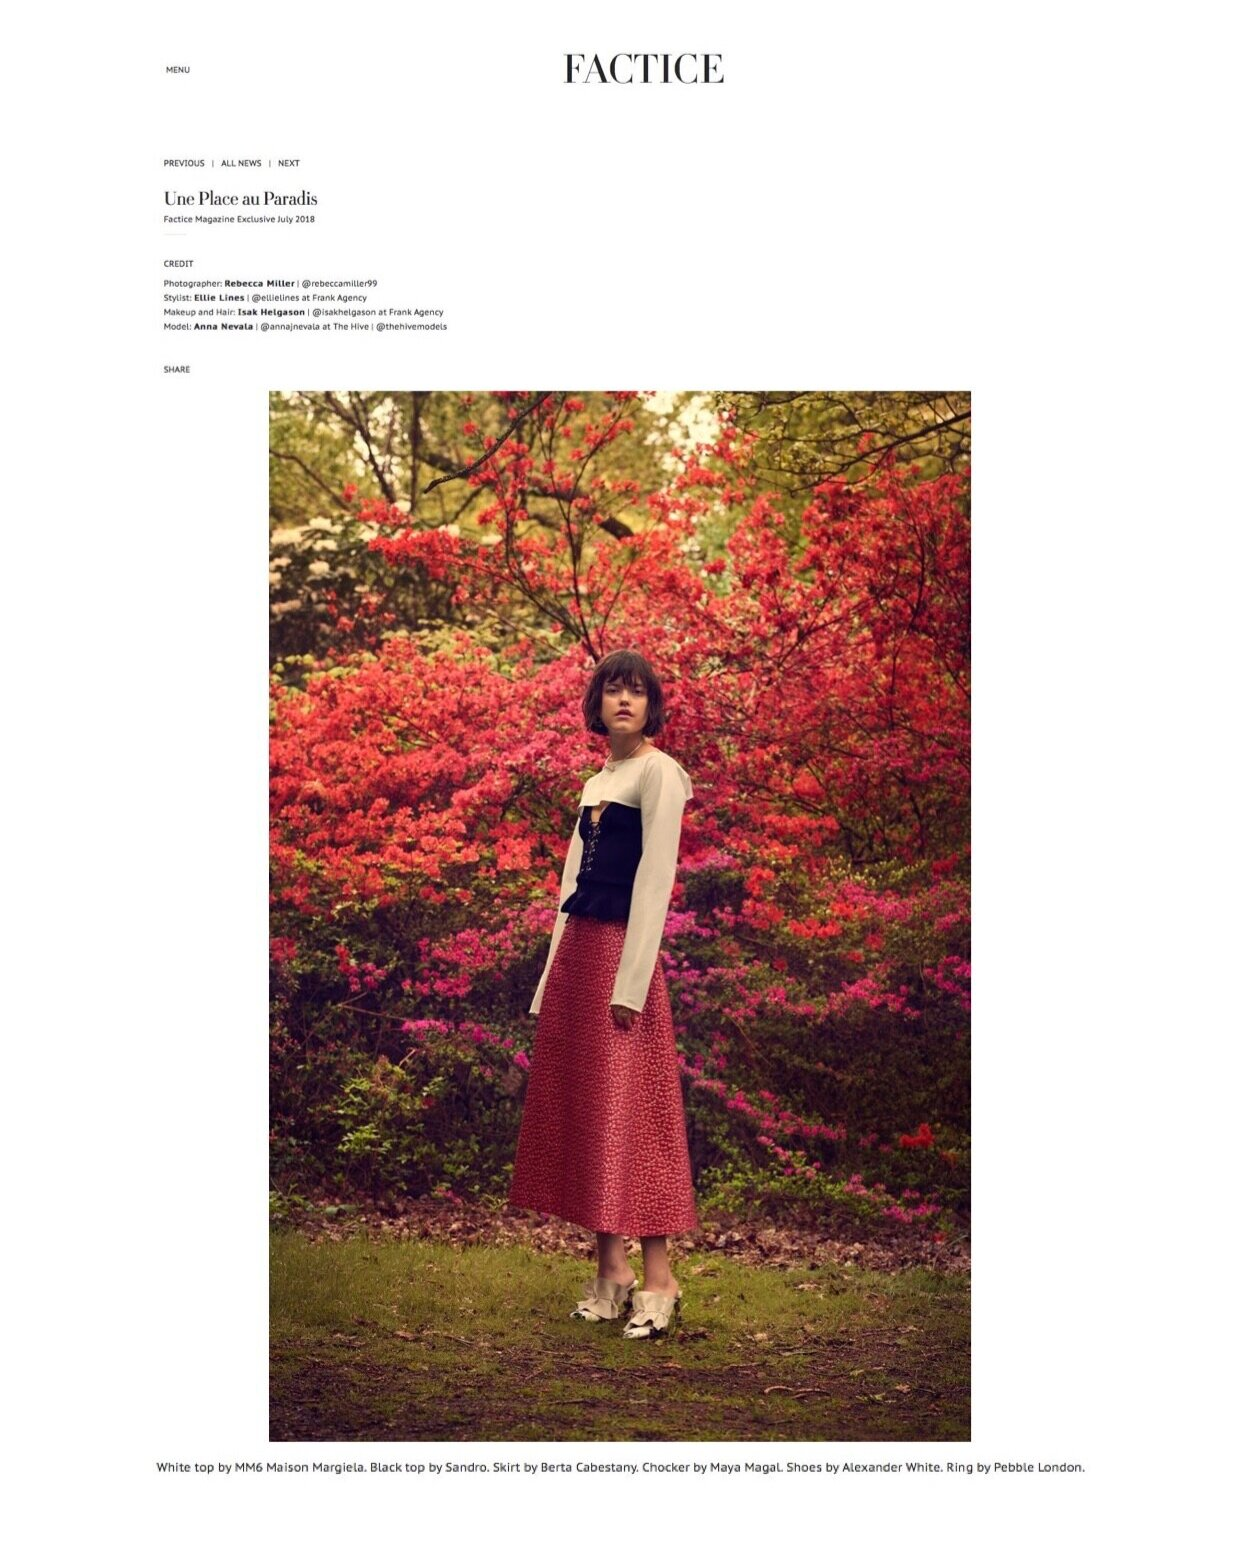 Factice+Magazine.jpg